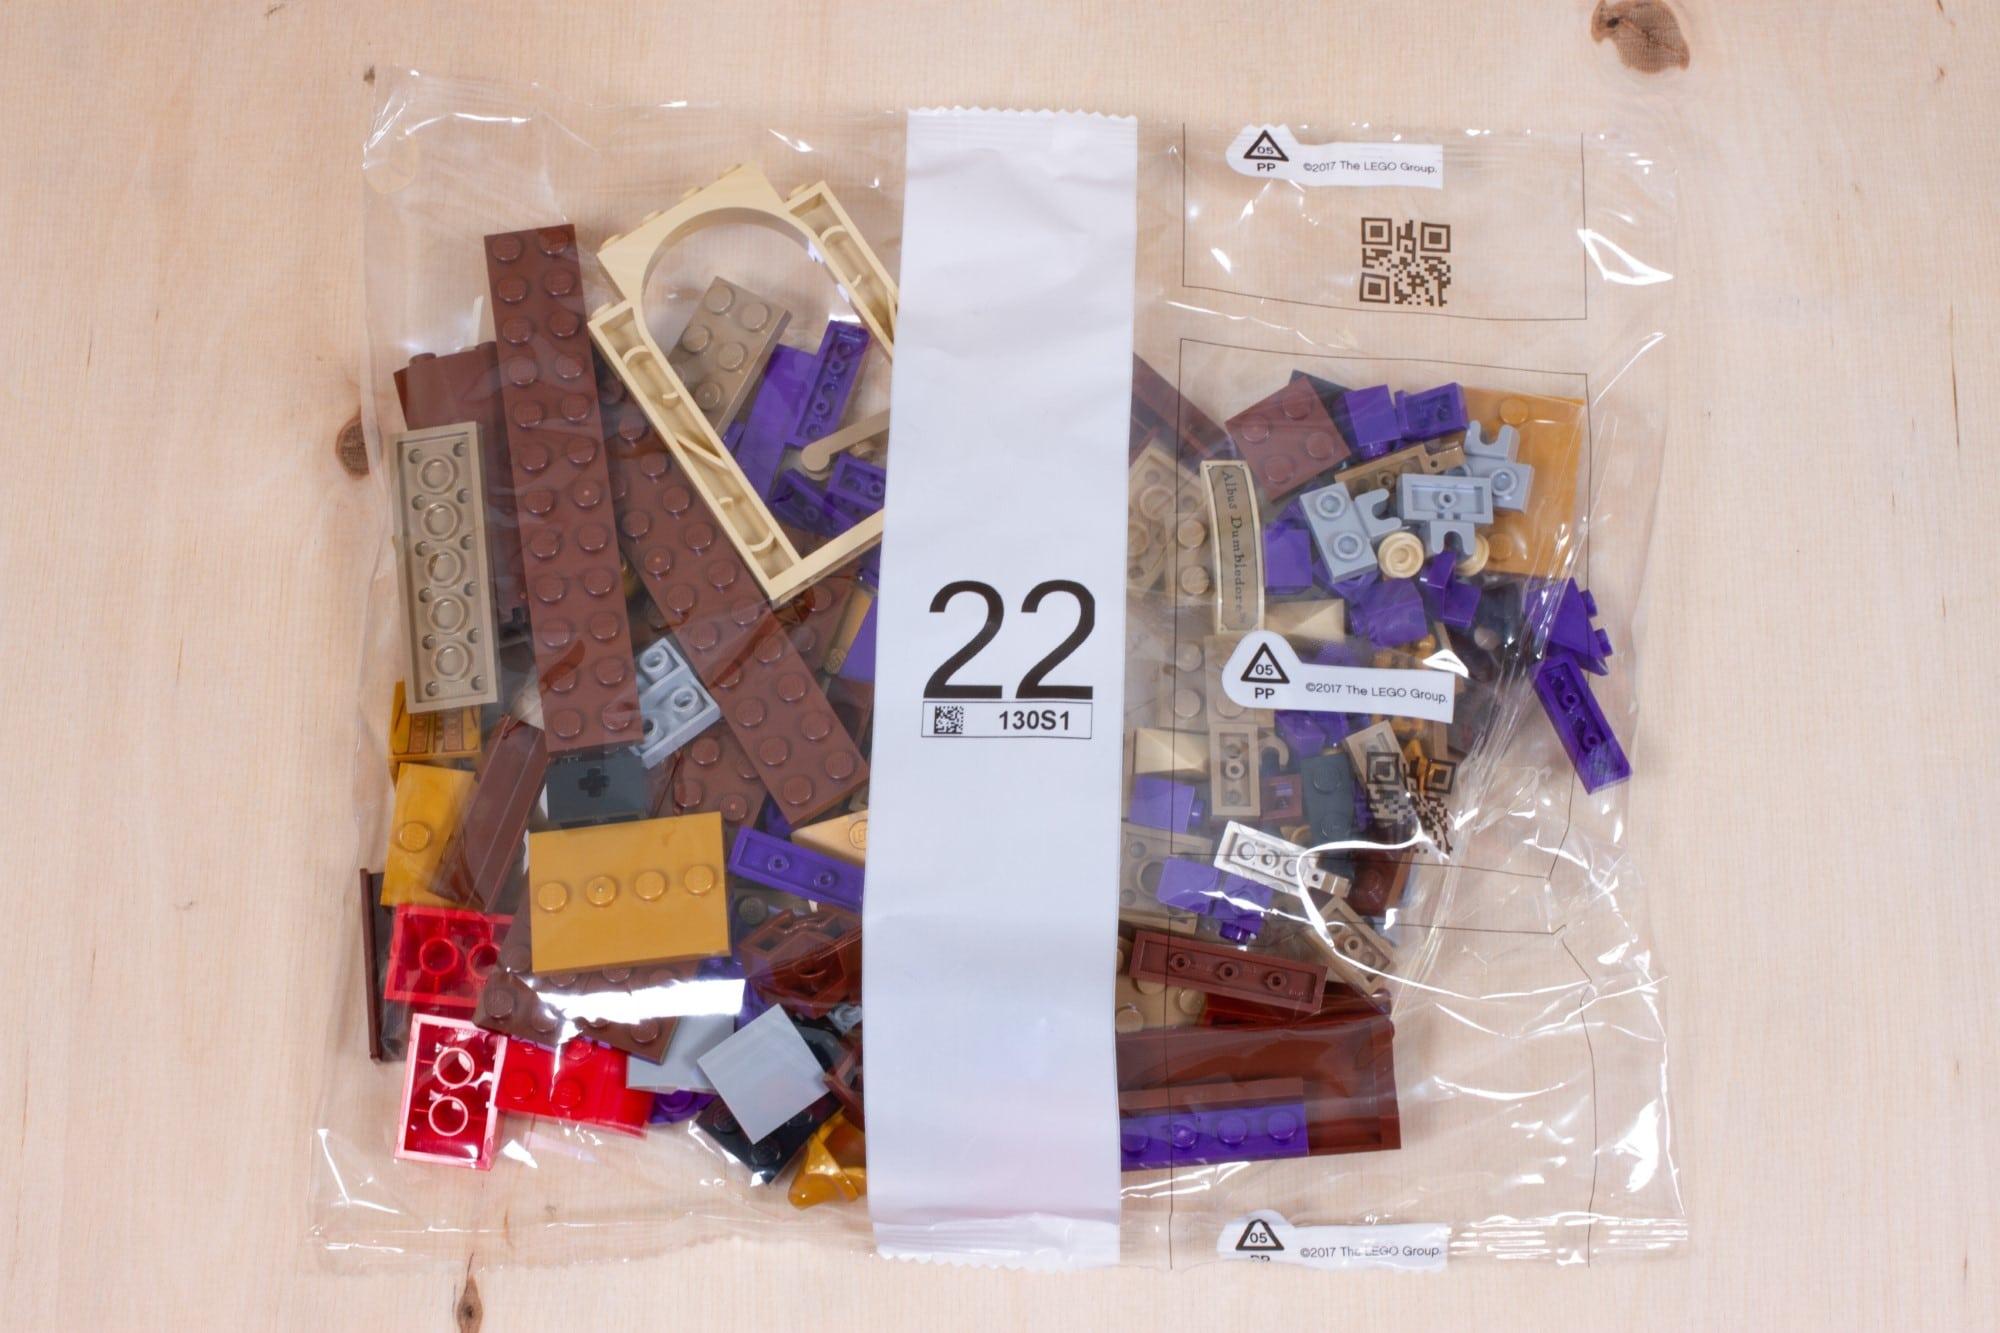 LEGO 76391 Hogwarts Icons Review Unboxing 1 Schritt 22